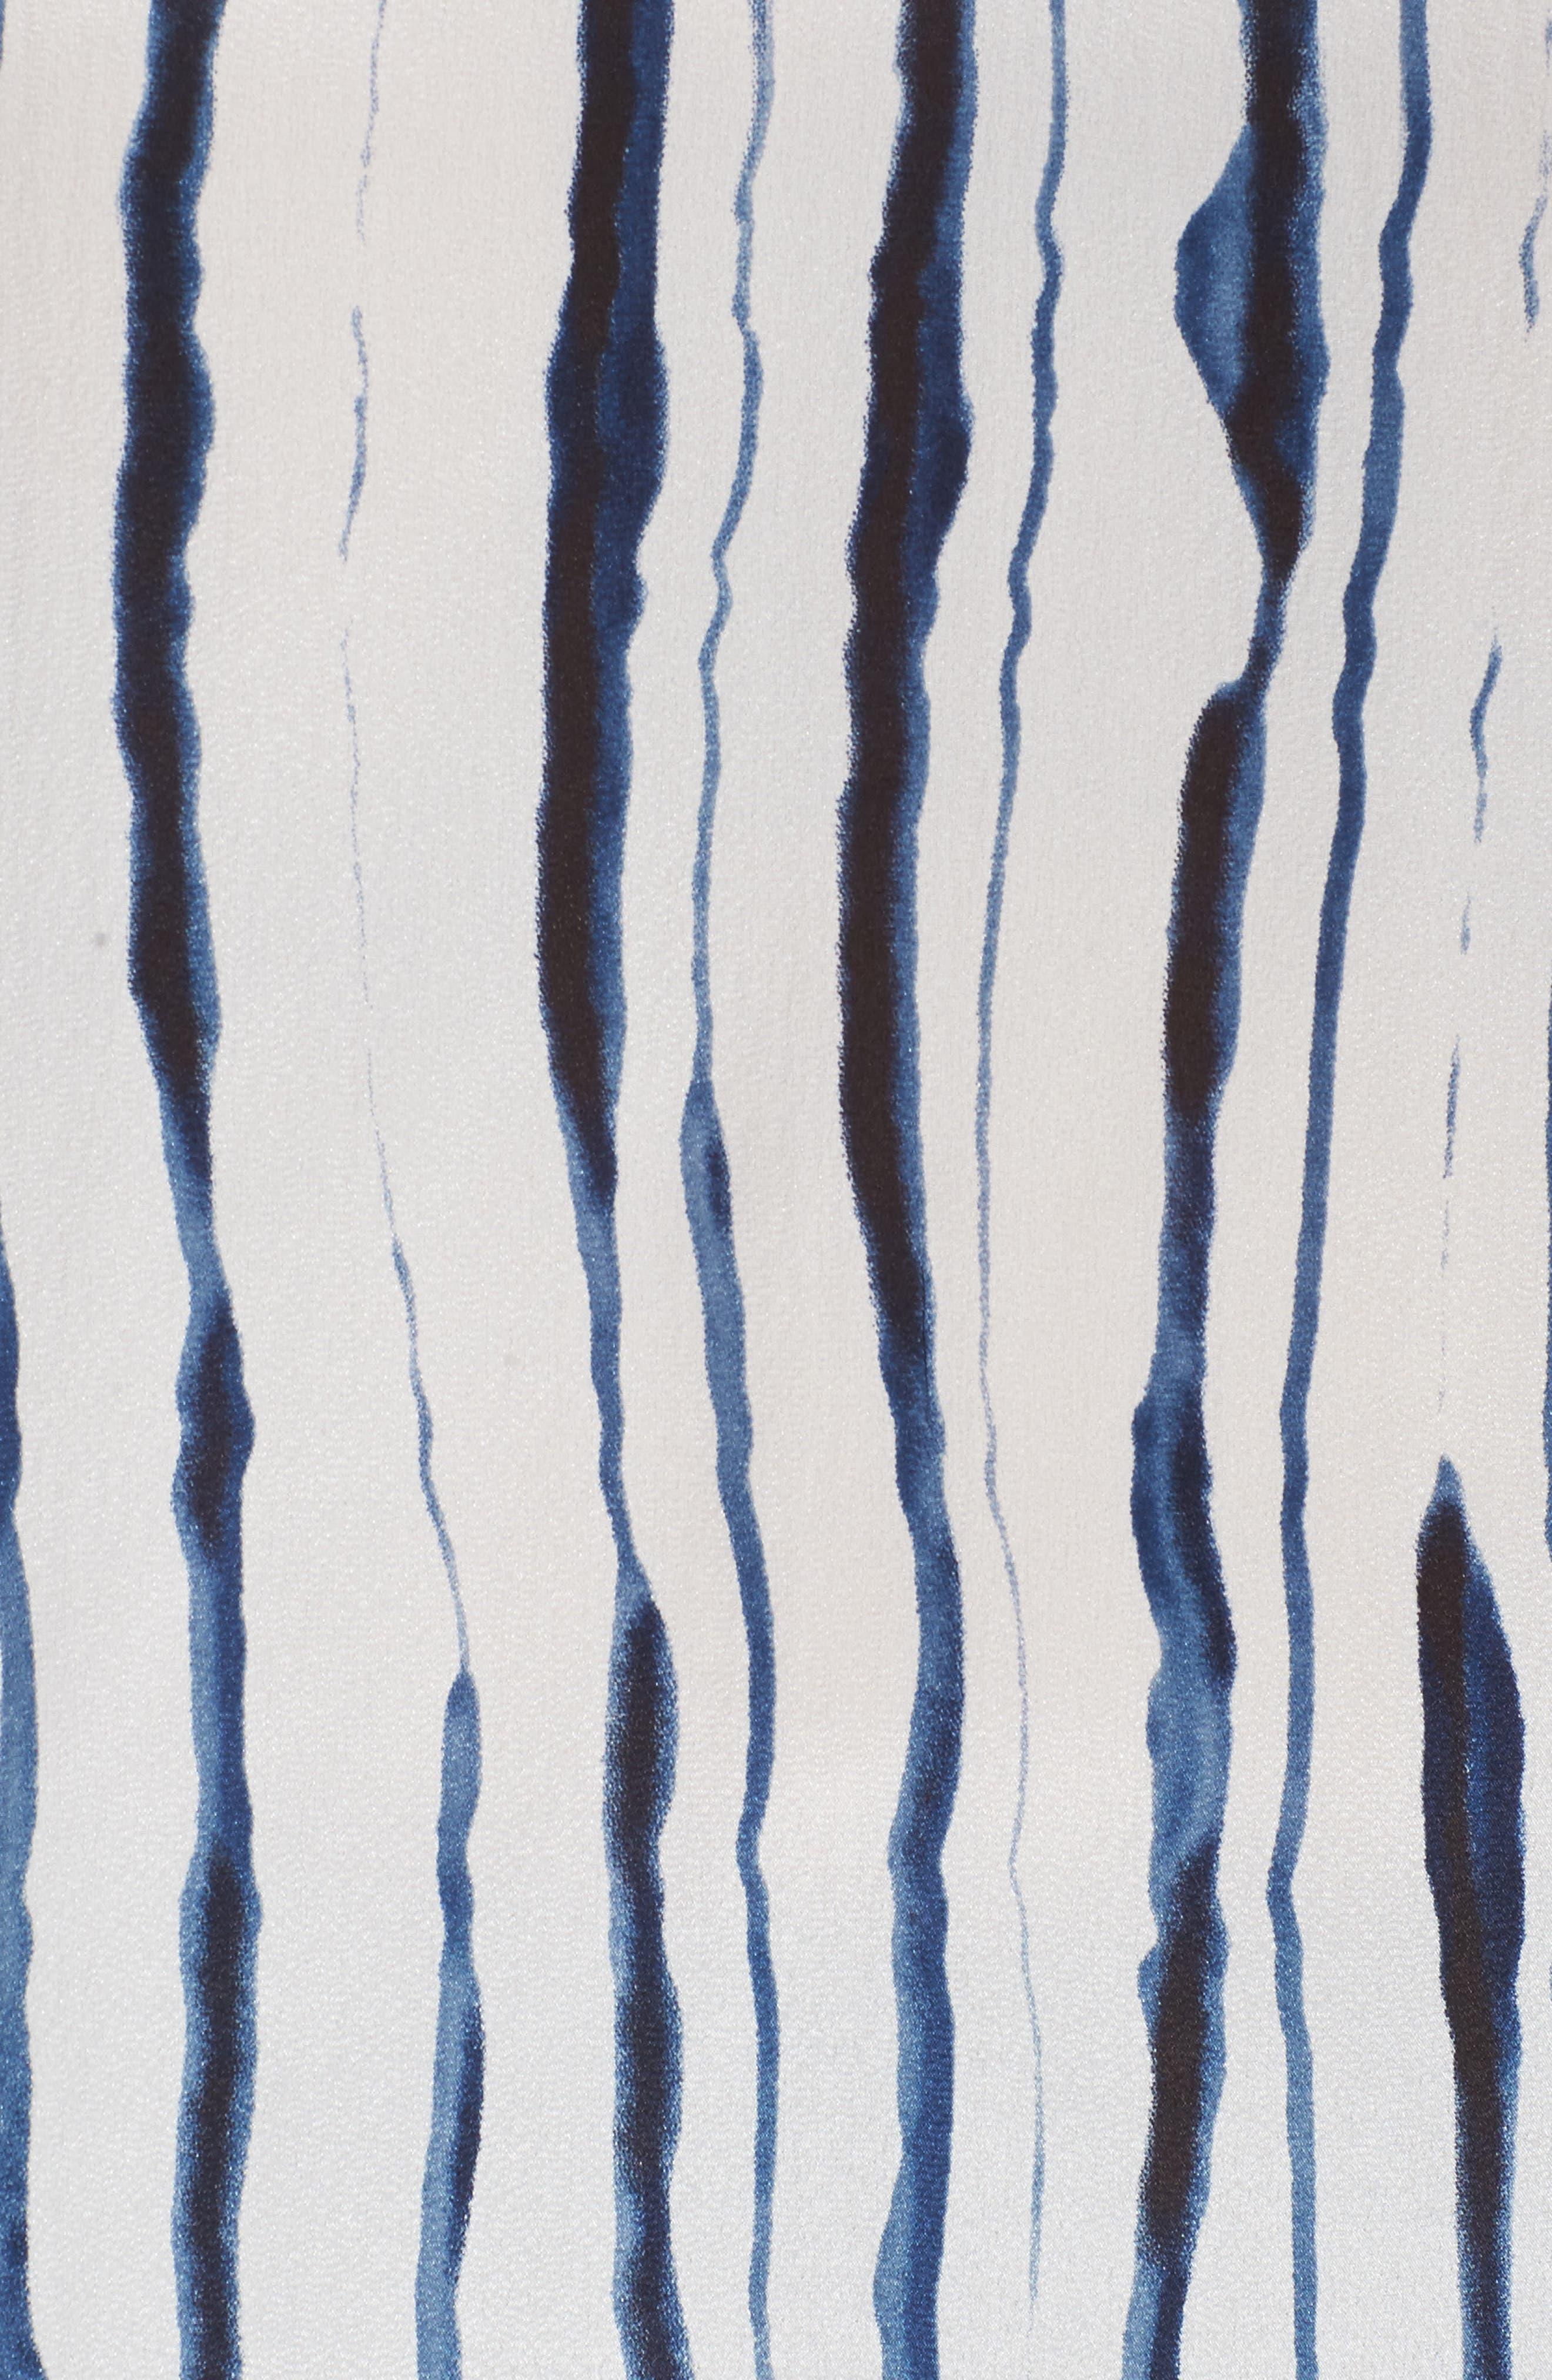 Fluid Ink Silk Blend Tee,                             Alternate thumbnail 5, color,                             400